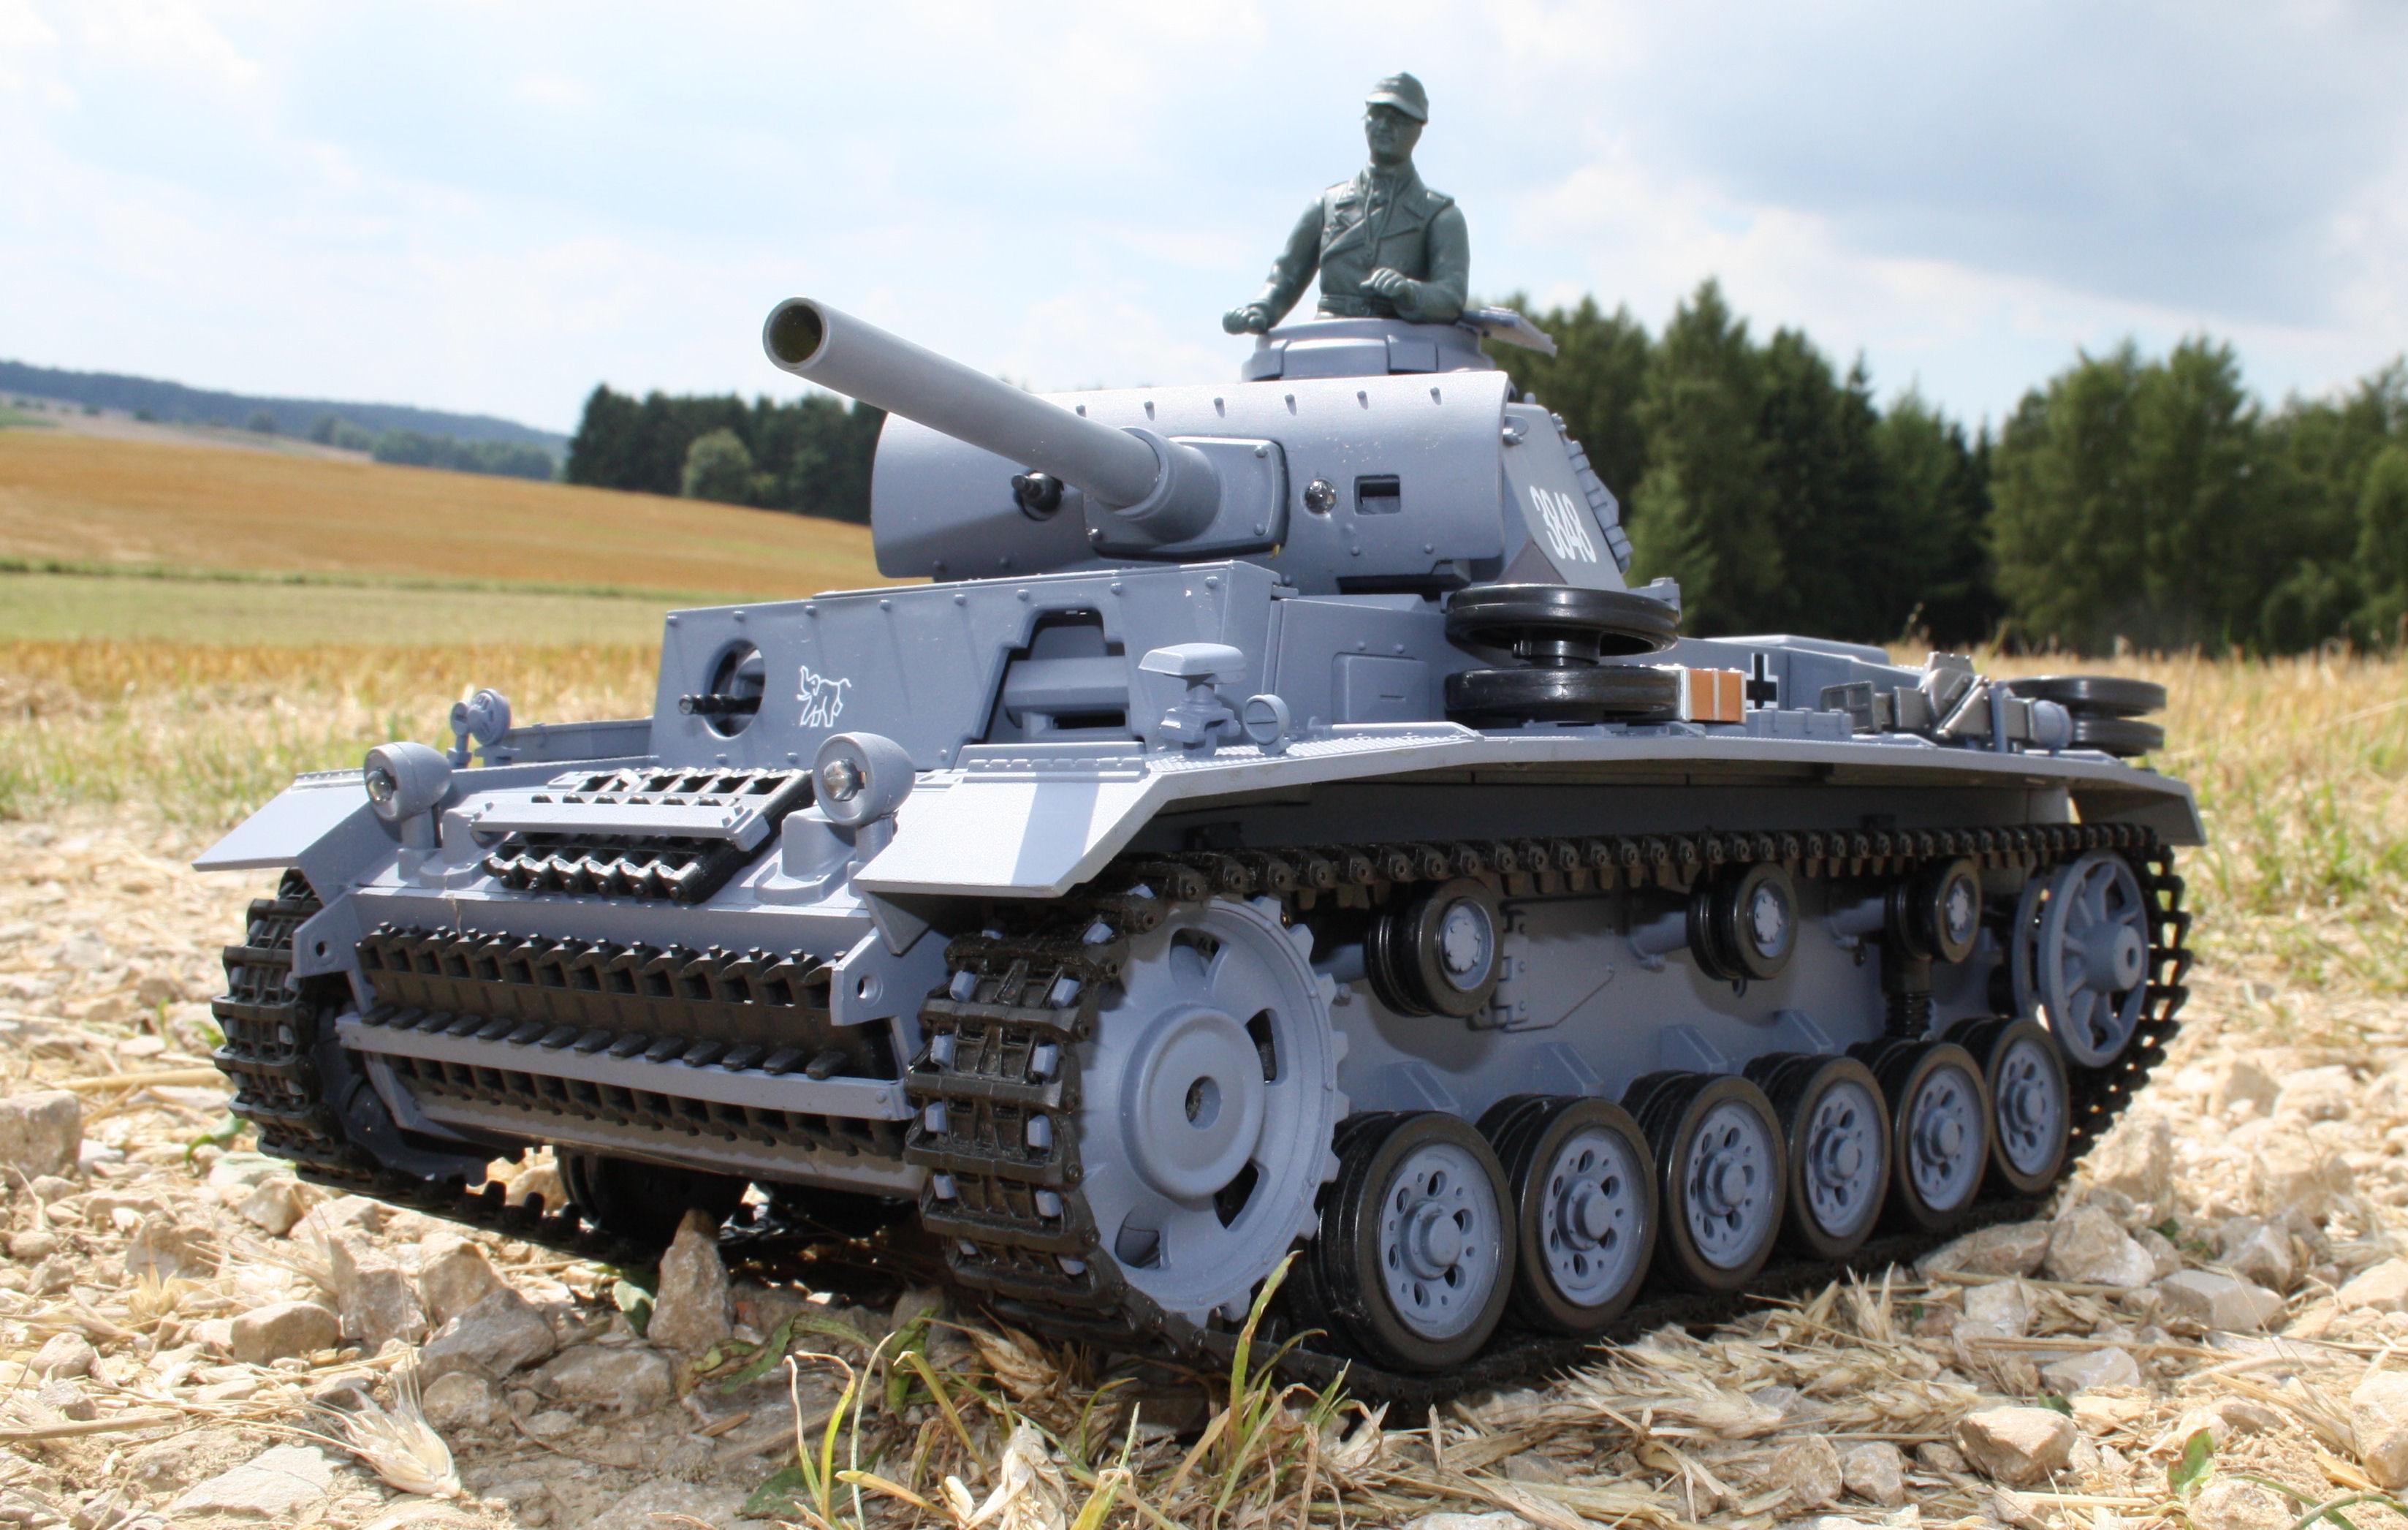 rc kampfpanzer panzerkampfwagen 3 mit schussfunktion. Black Bedroom Furniture Sets. Home Design Ideas